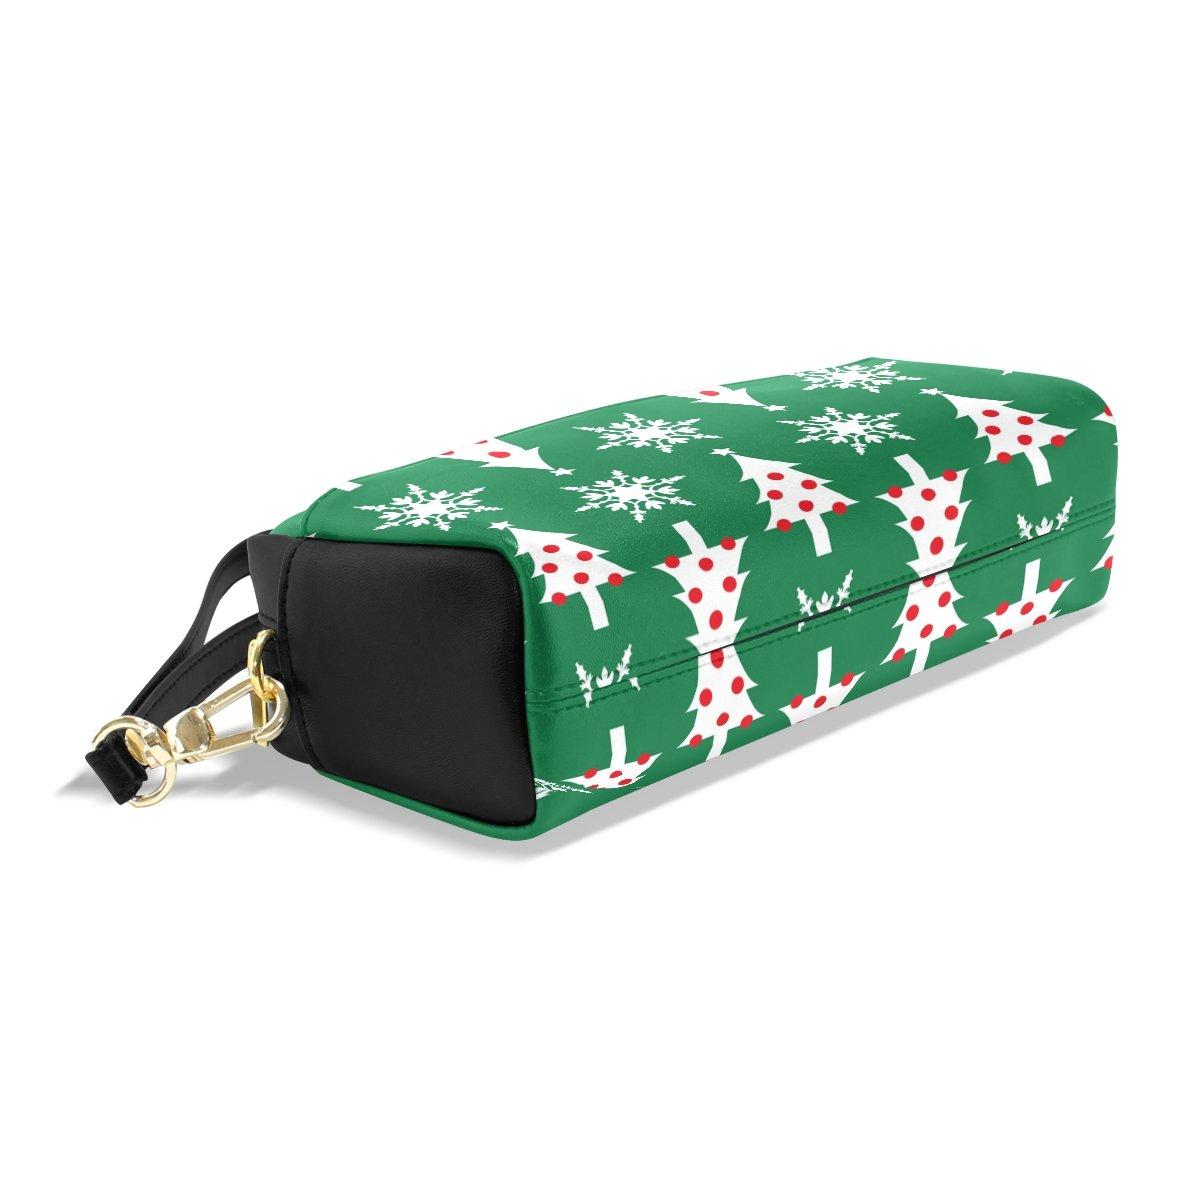 BENNIGIRY Weihnachtsbaum Bleistift Fall tragbar Pen Pen Pen Tasche Student Schreibwaren Pouch PU Leder Groß Kapazität Reißverschluss Make-up Kosmetiktasche B077ZN76RV     | Kostengünstig  192f5d